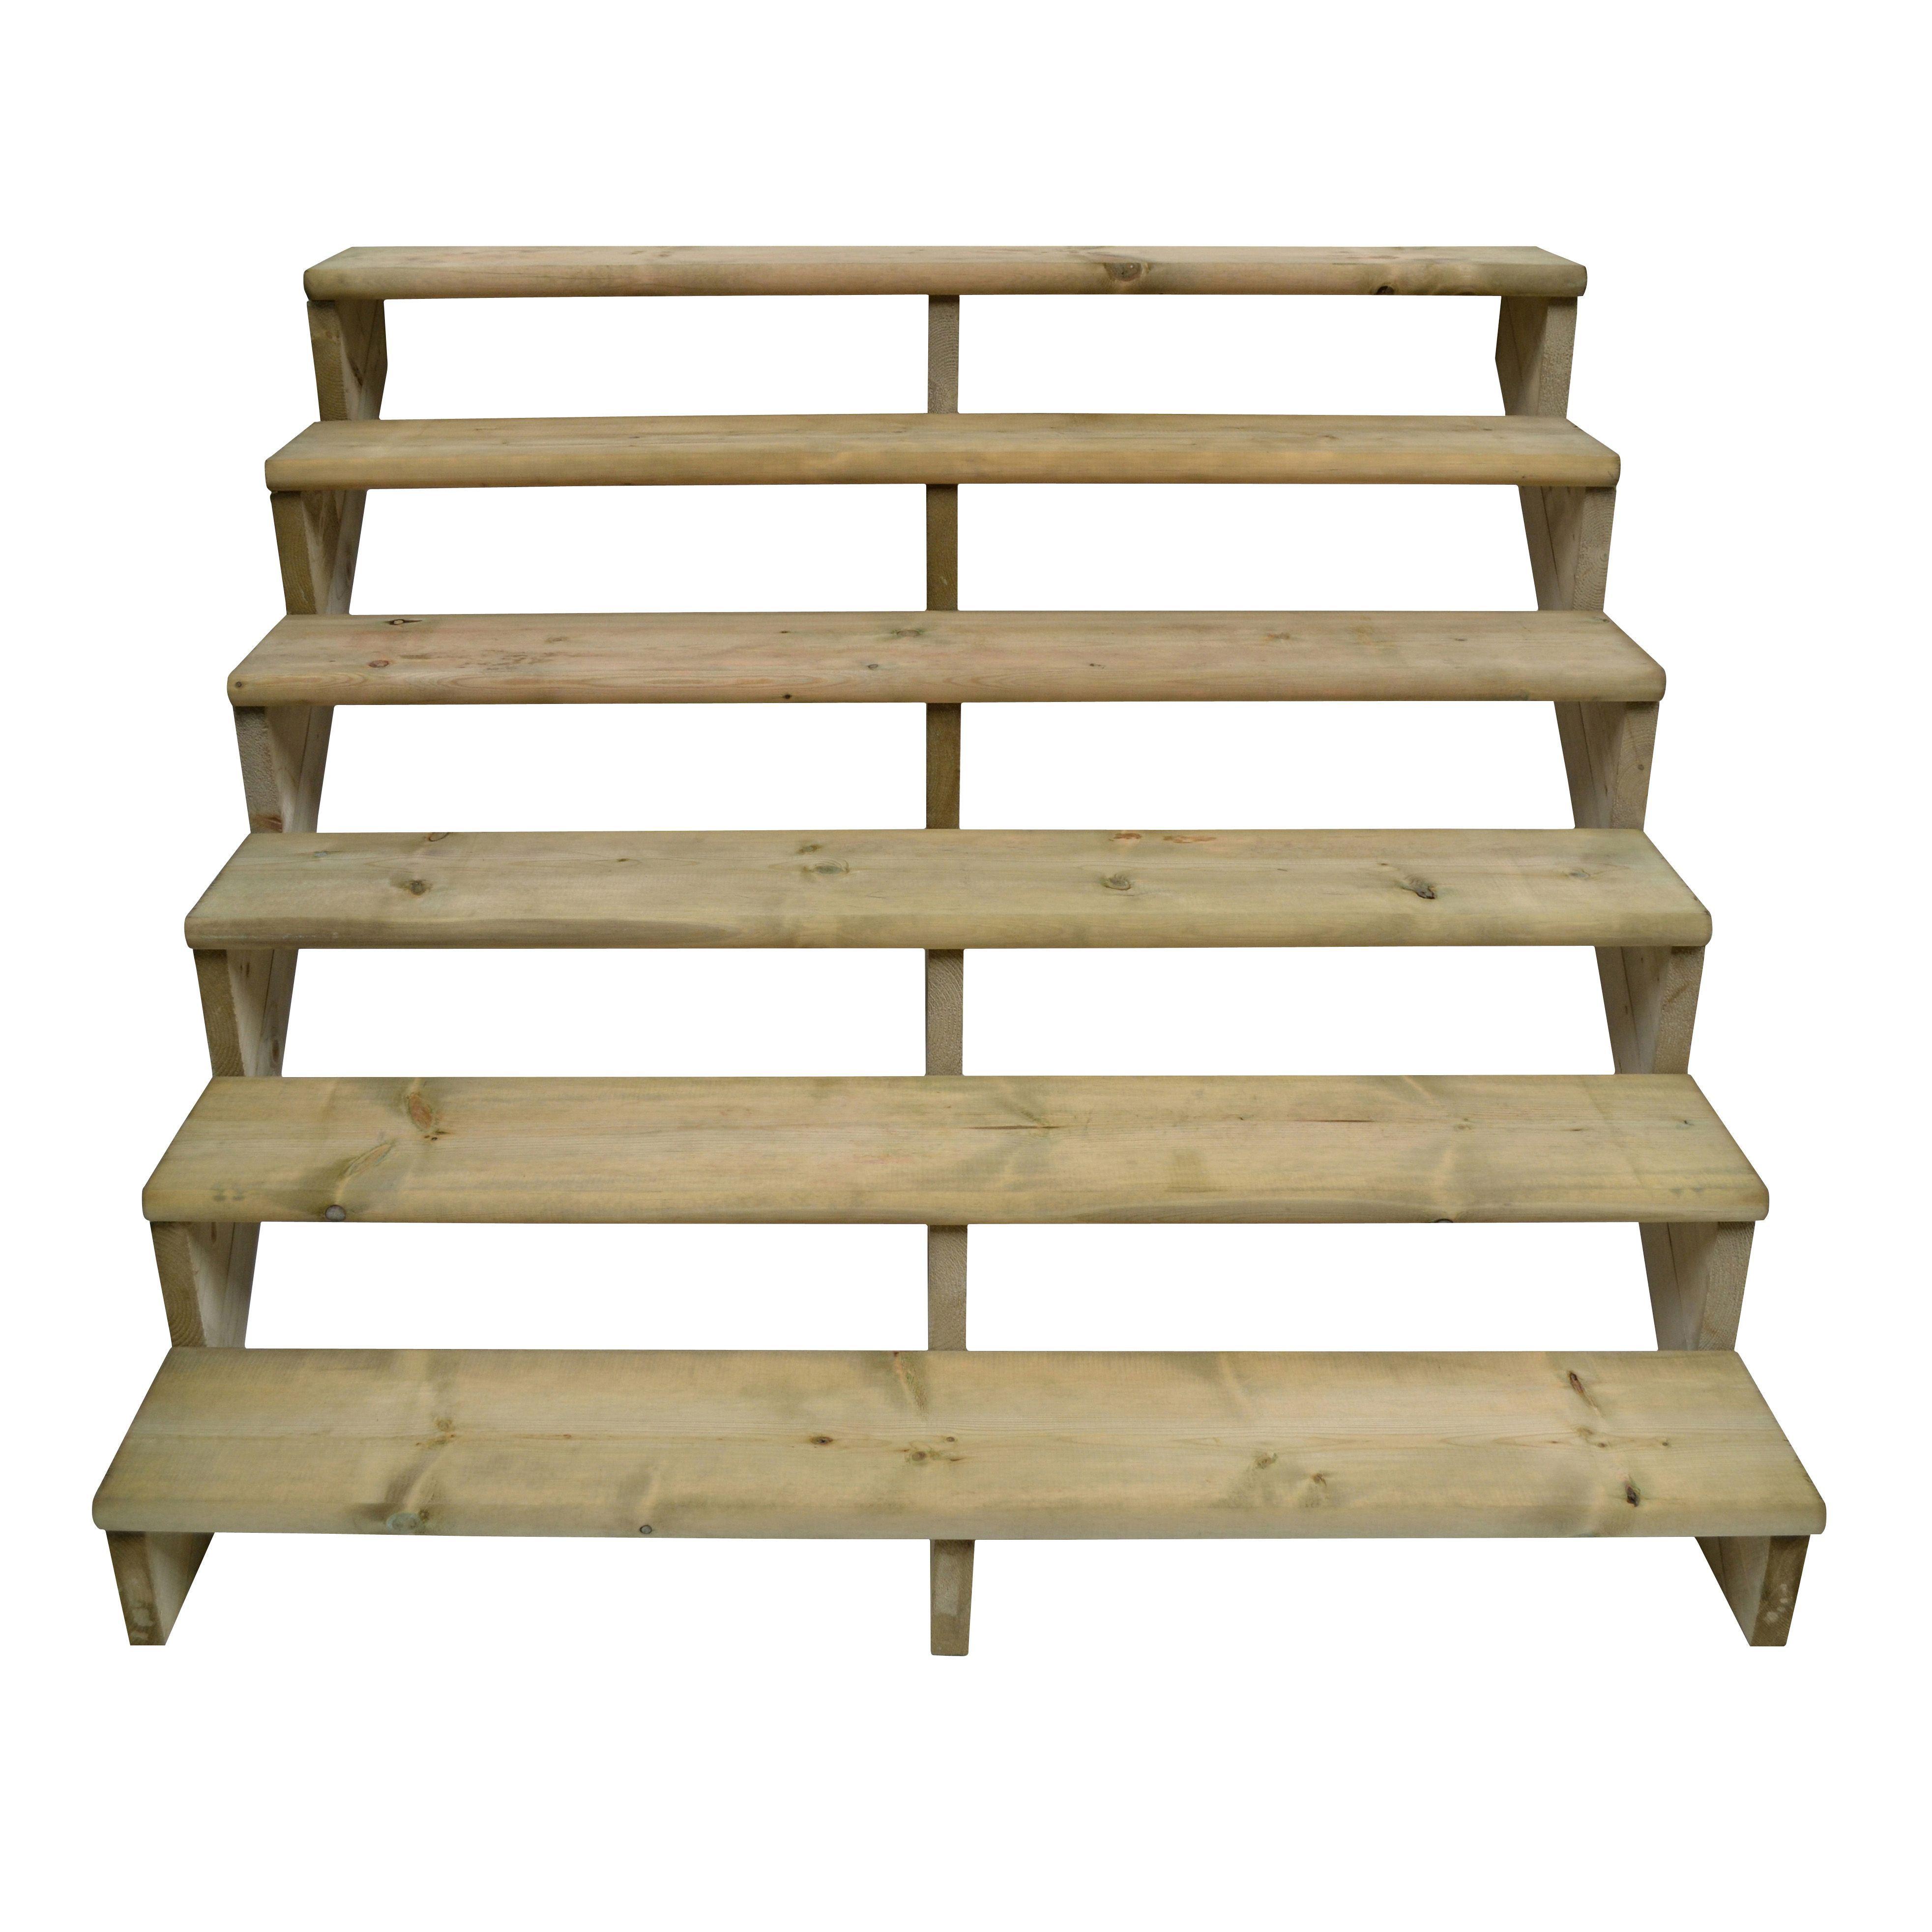 step deck stair kit departments diy at b q. Black Bedroom Furniture Sets. Home Design Ideas